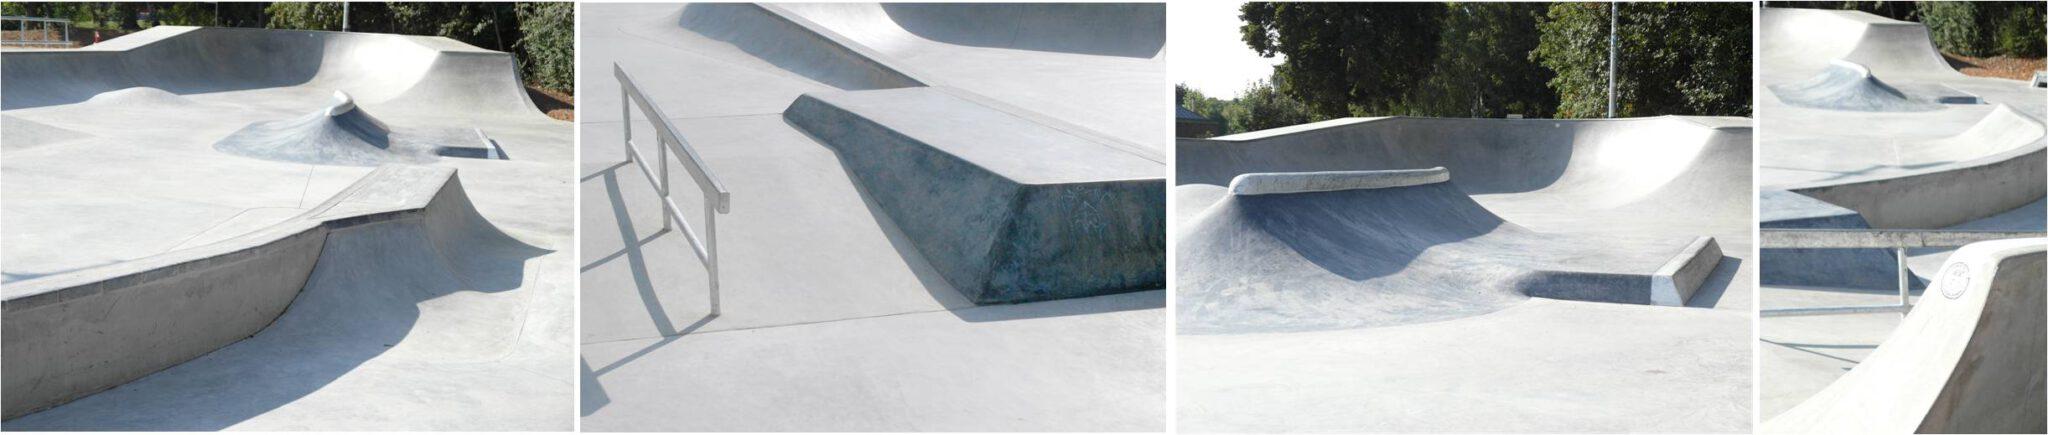 skatepark_detail